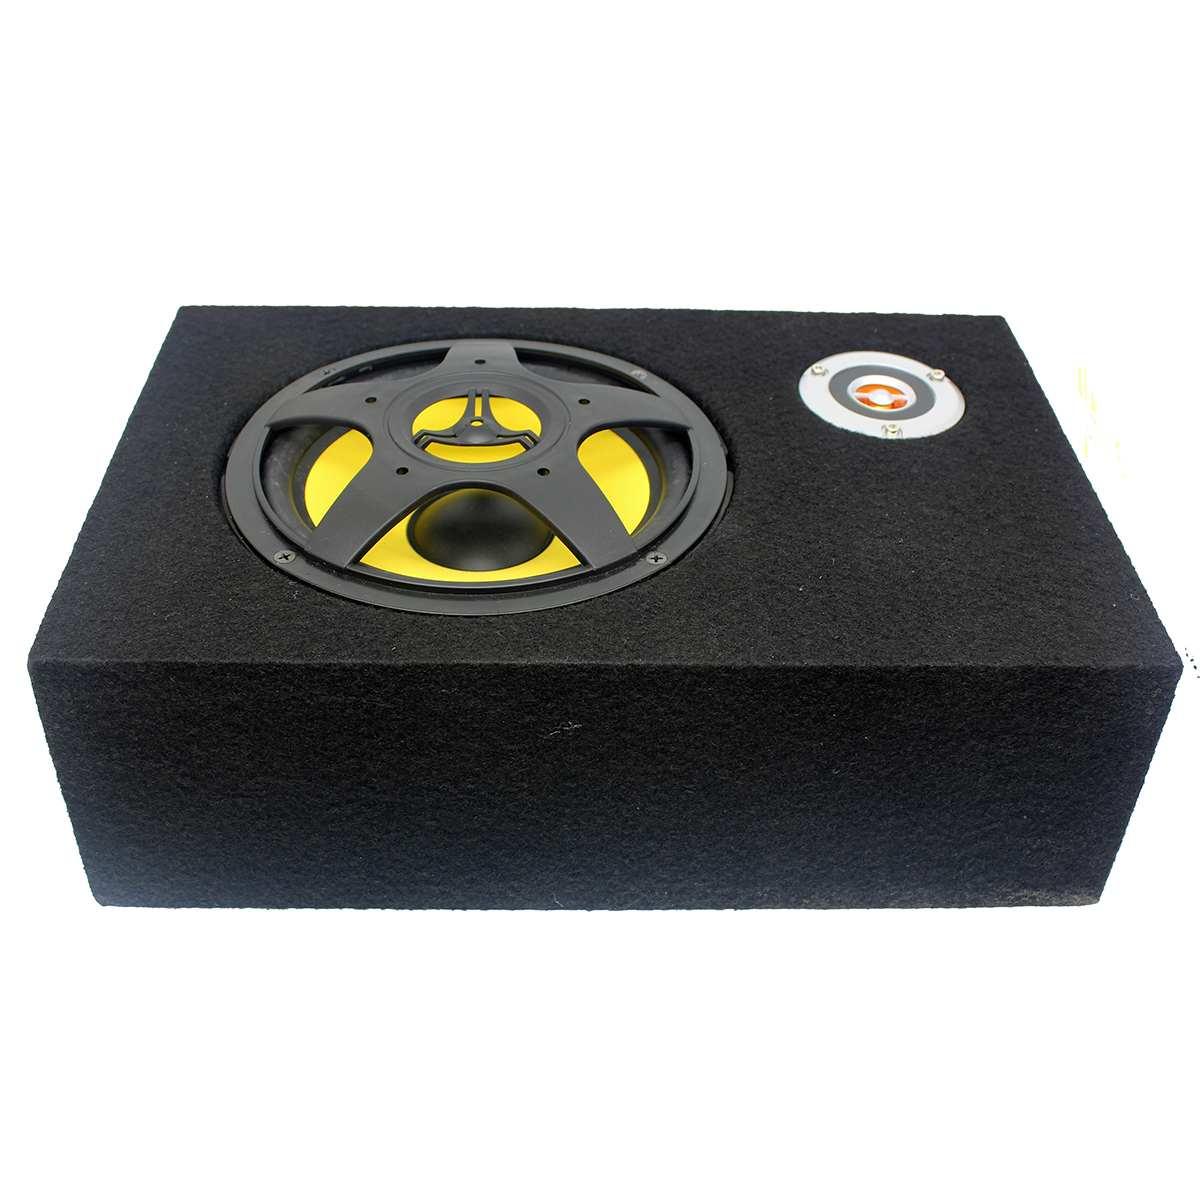 8 zoll 480W Unter-Sitz Auto Subwoofer Geändert Lautsprecher Stereo Audio Bass Verstärker Subwoofer Auto Audio Auto Lautsprecher